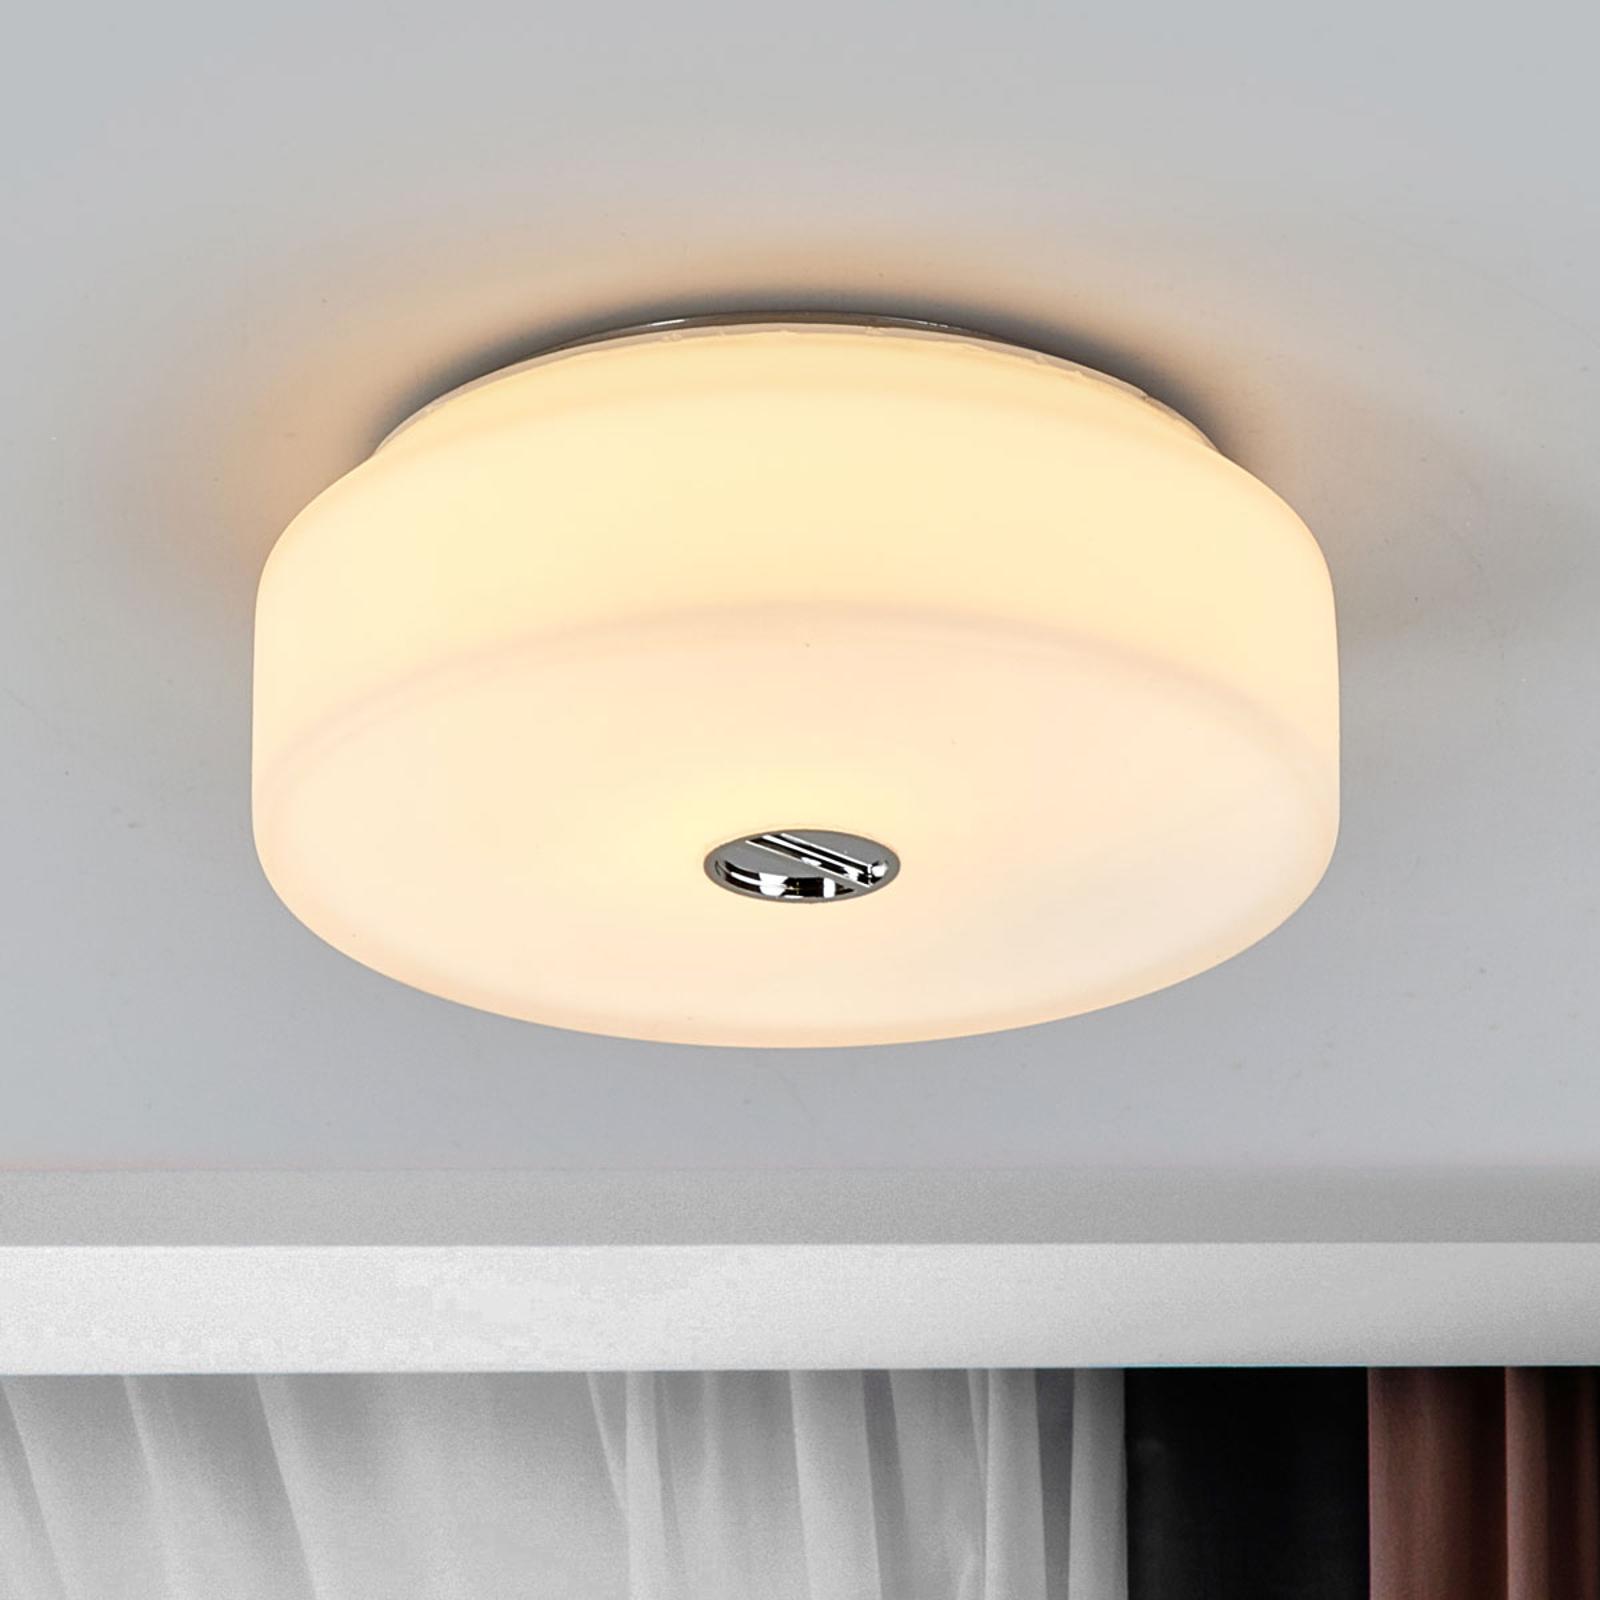 Lampa sufitowa MINI BUTTON firmy FLOS